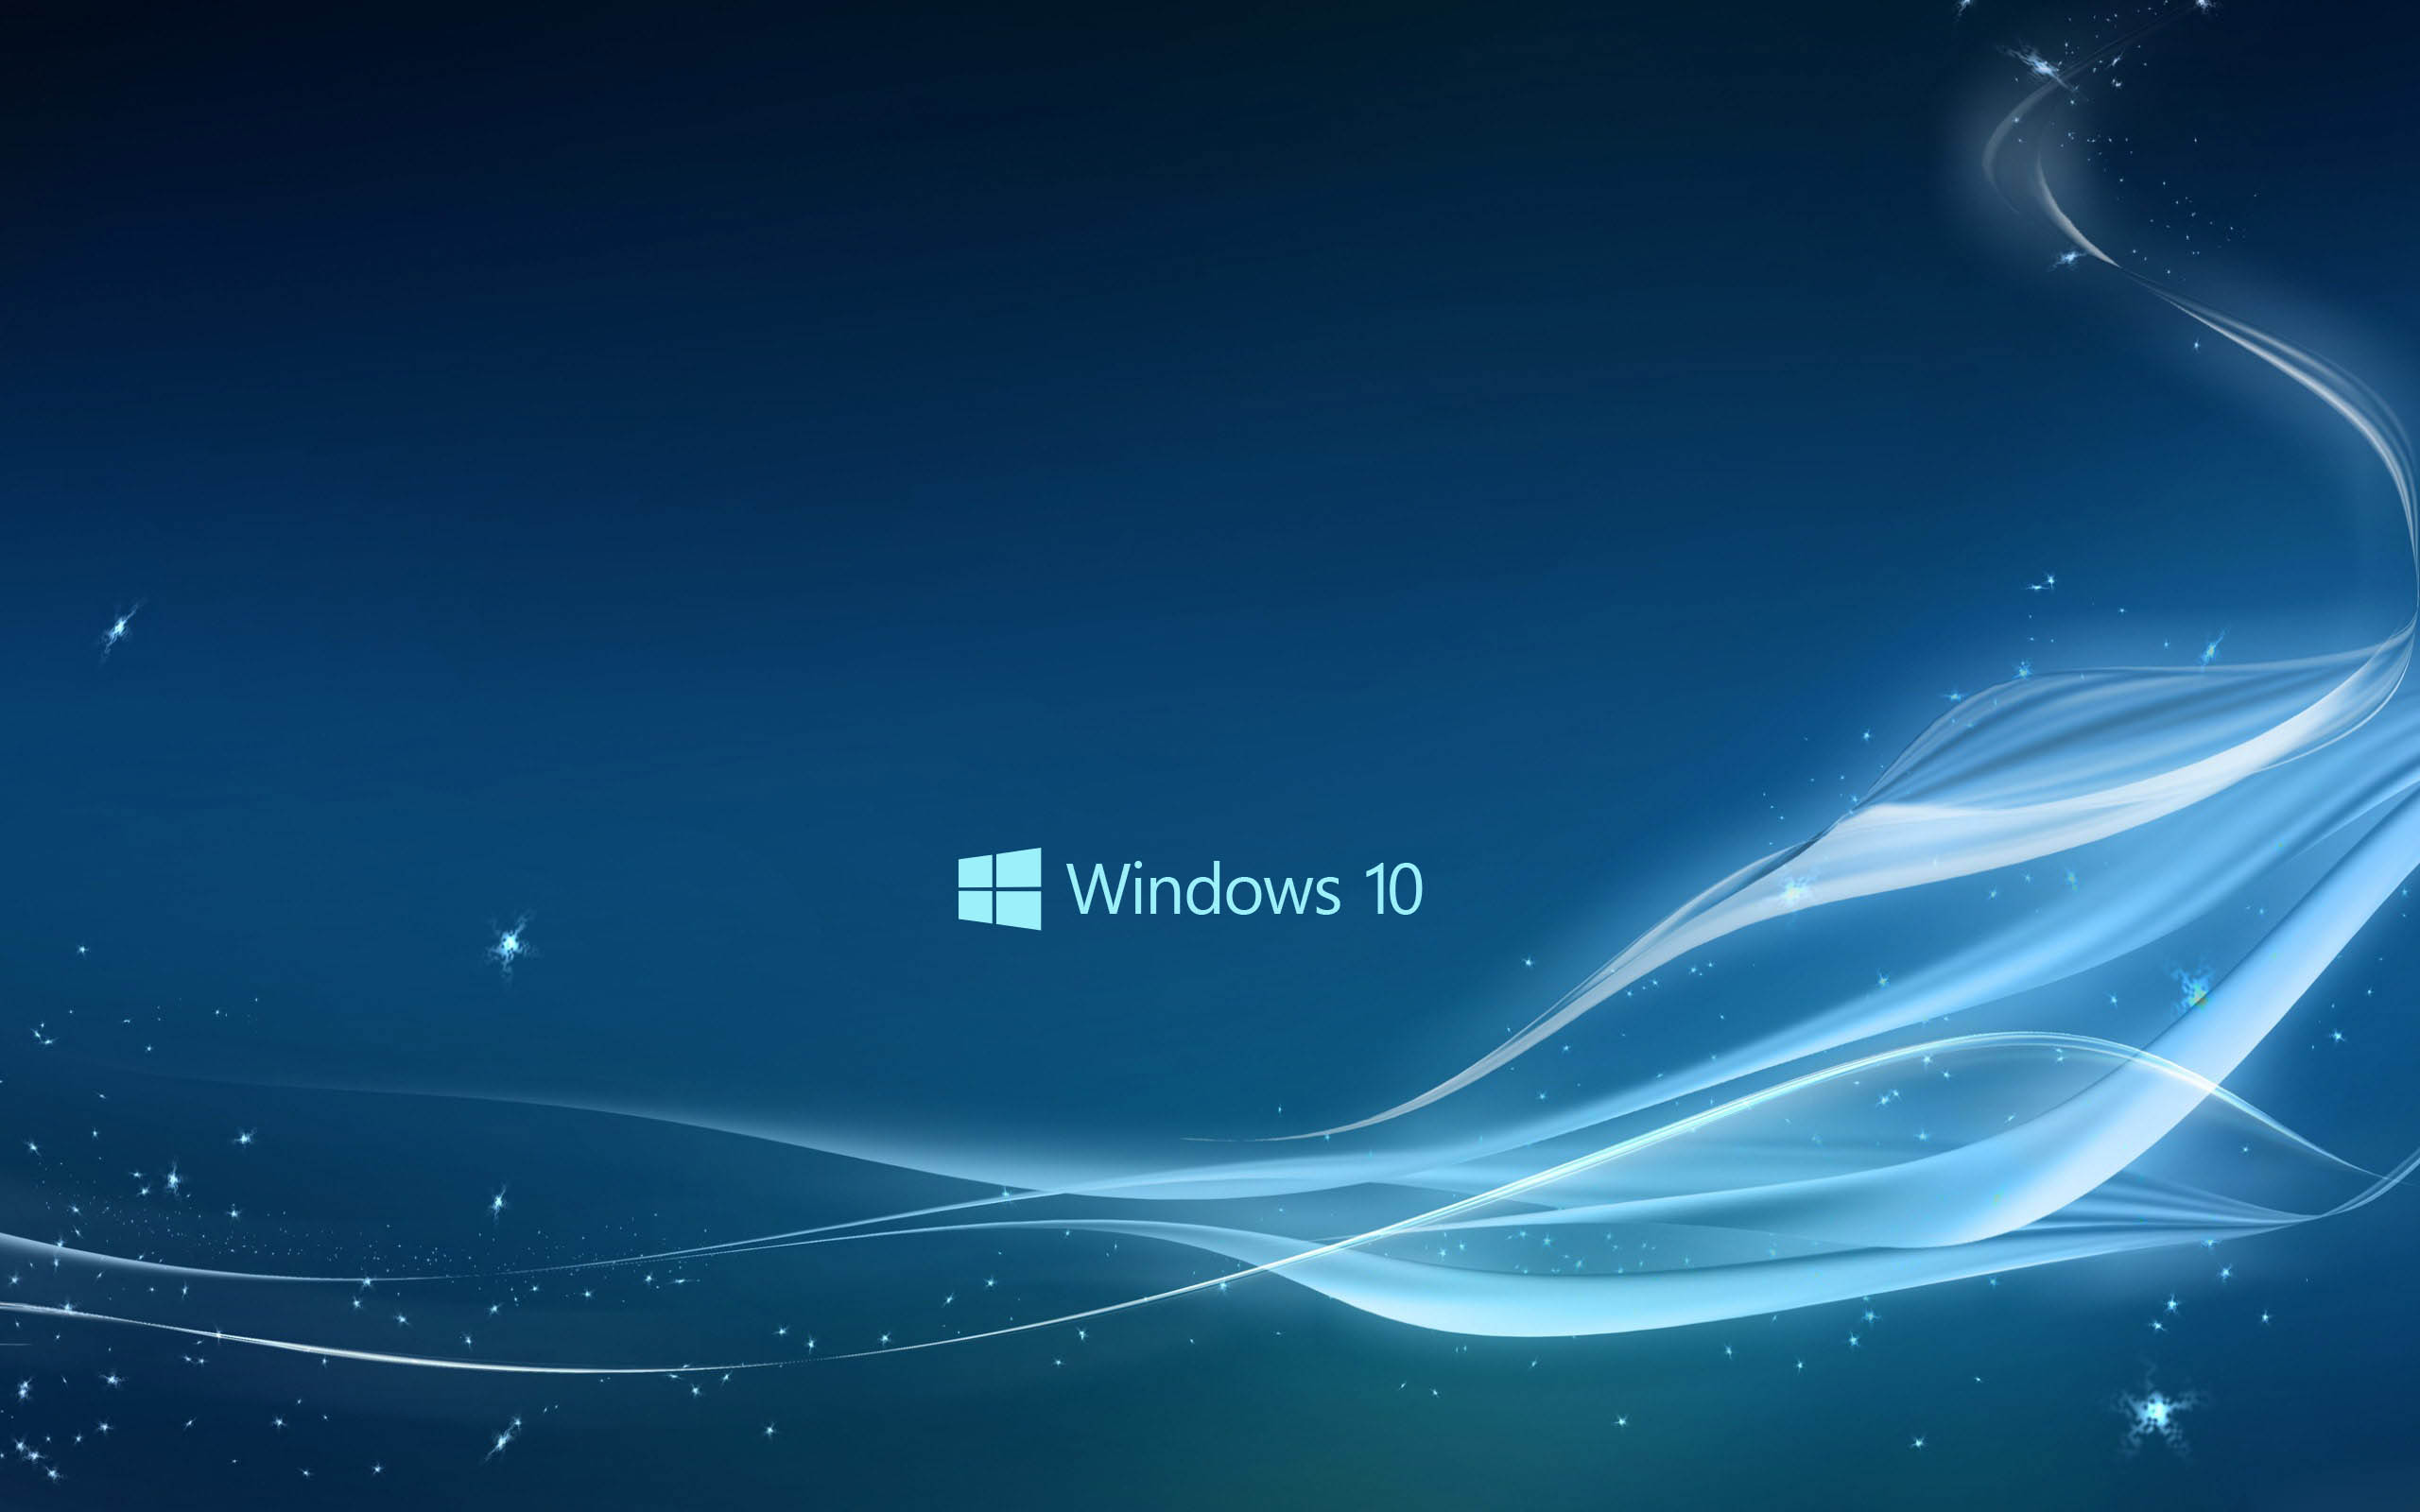 Windows 10 Wallpaper Wallpaper